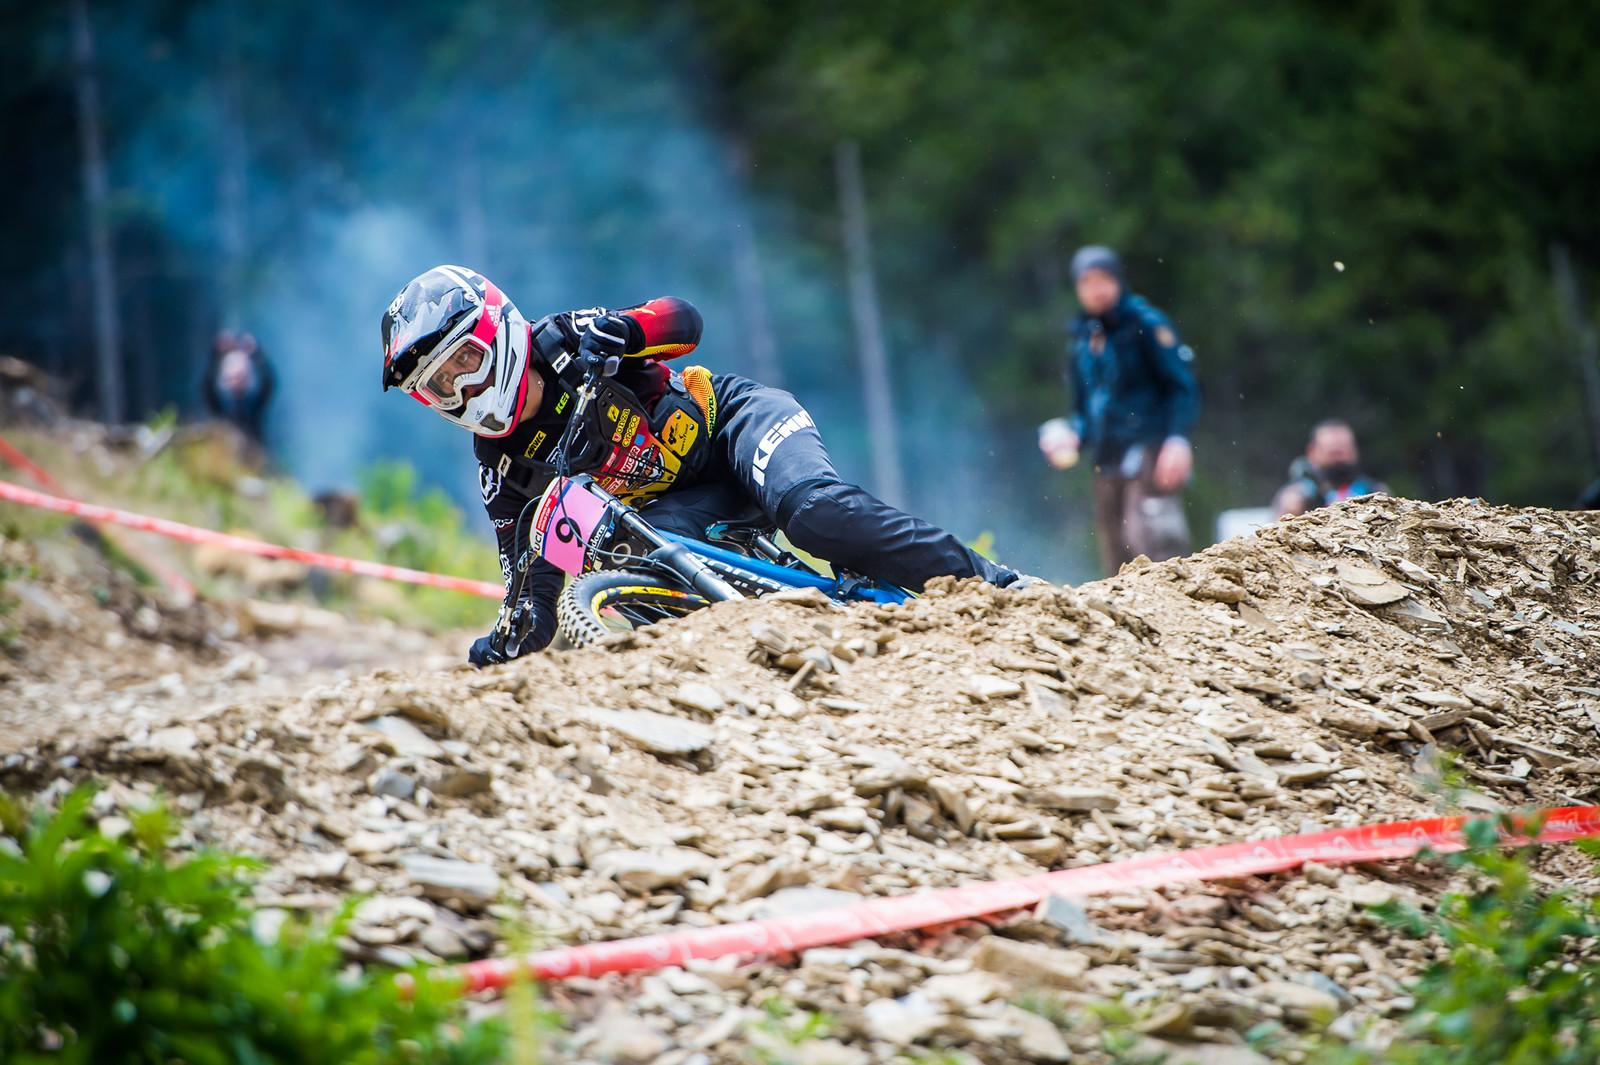 Marine Cabirou Finals - iceman2058 - Mountain Biking Pictures - Vital MTB